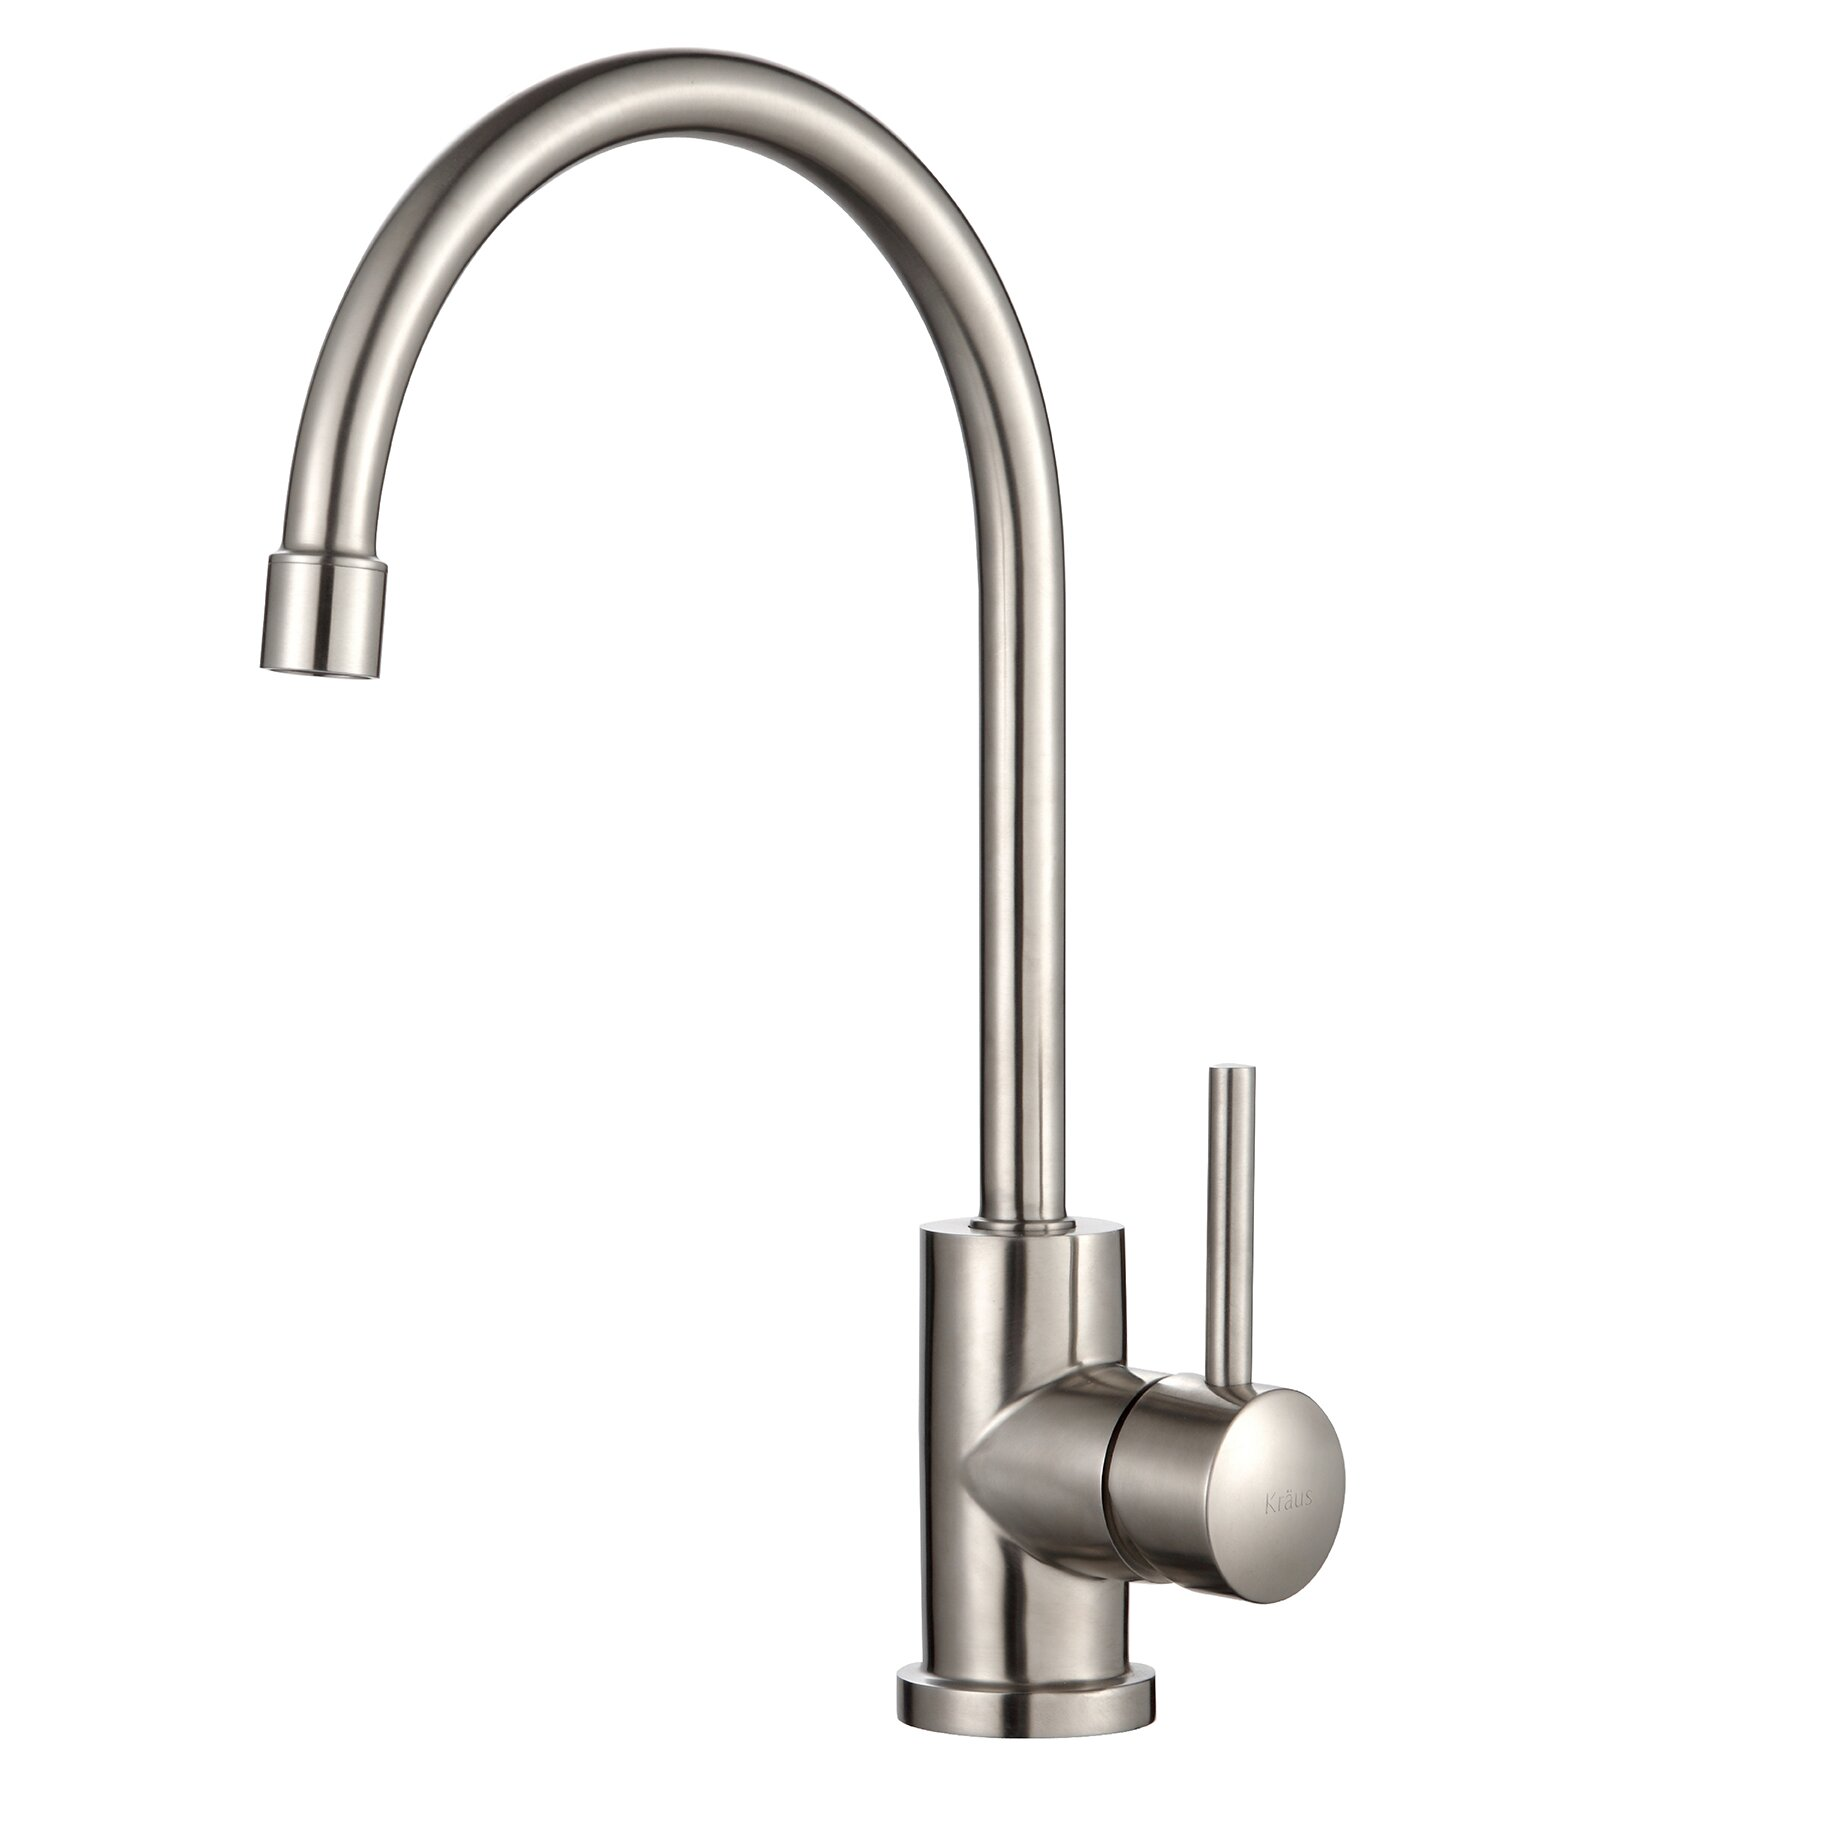 Kraus One Handle Single Hole Kitchen Faucet & Reviews Wayfair